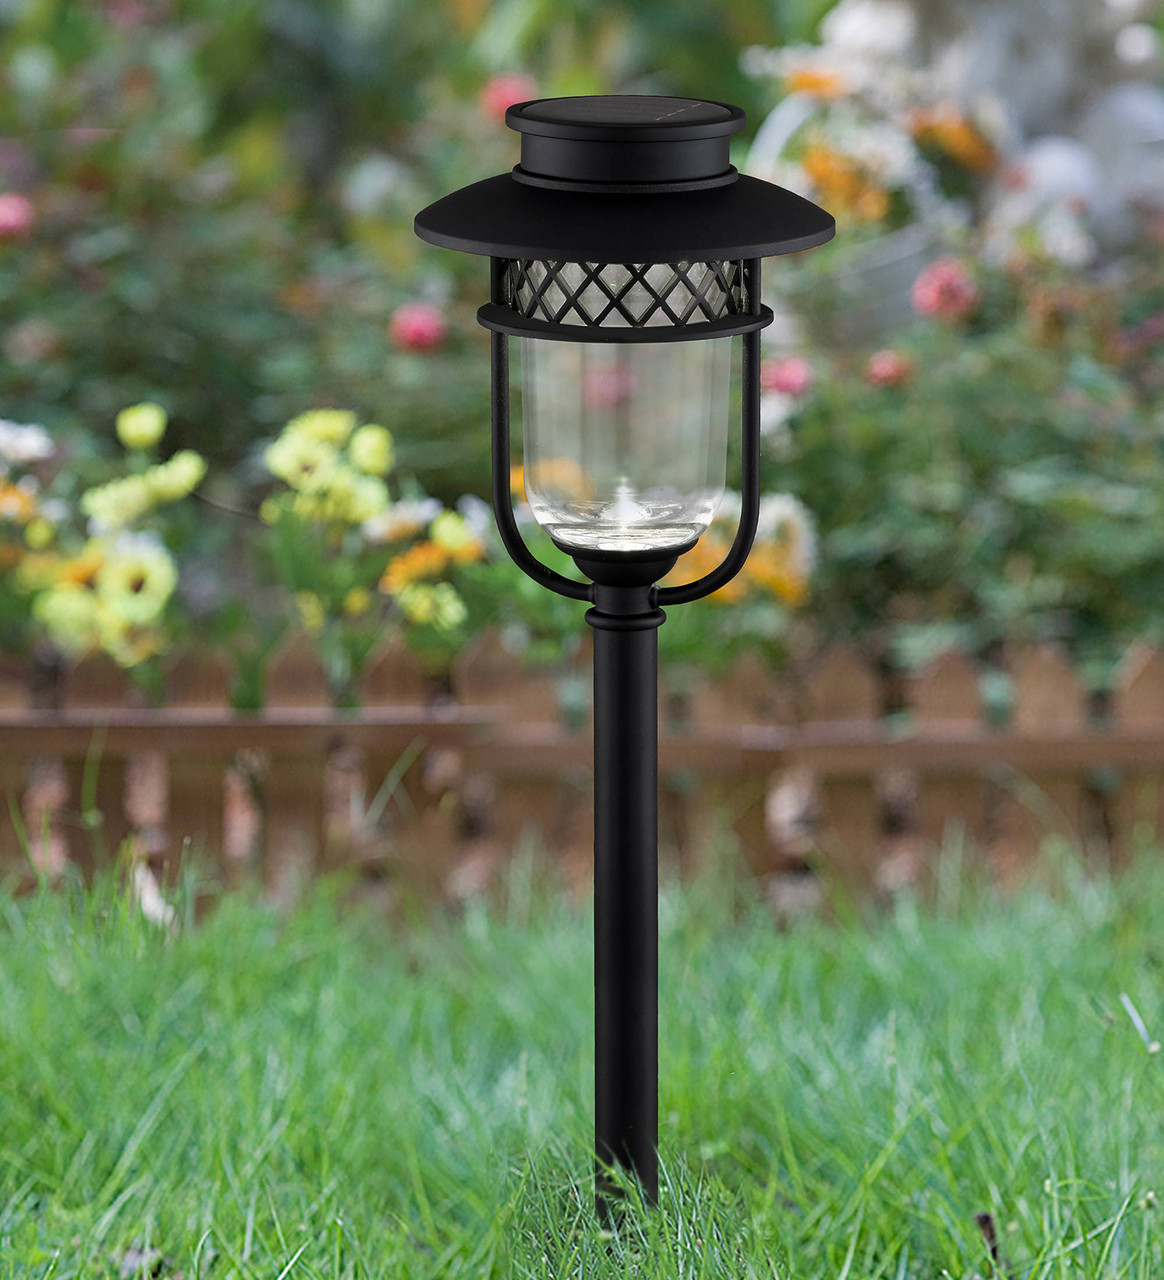 Classy Caps' Black Stainless Steel Garden Light in Ground